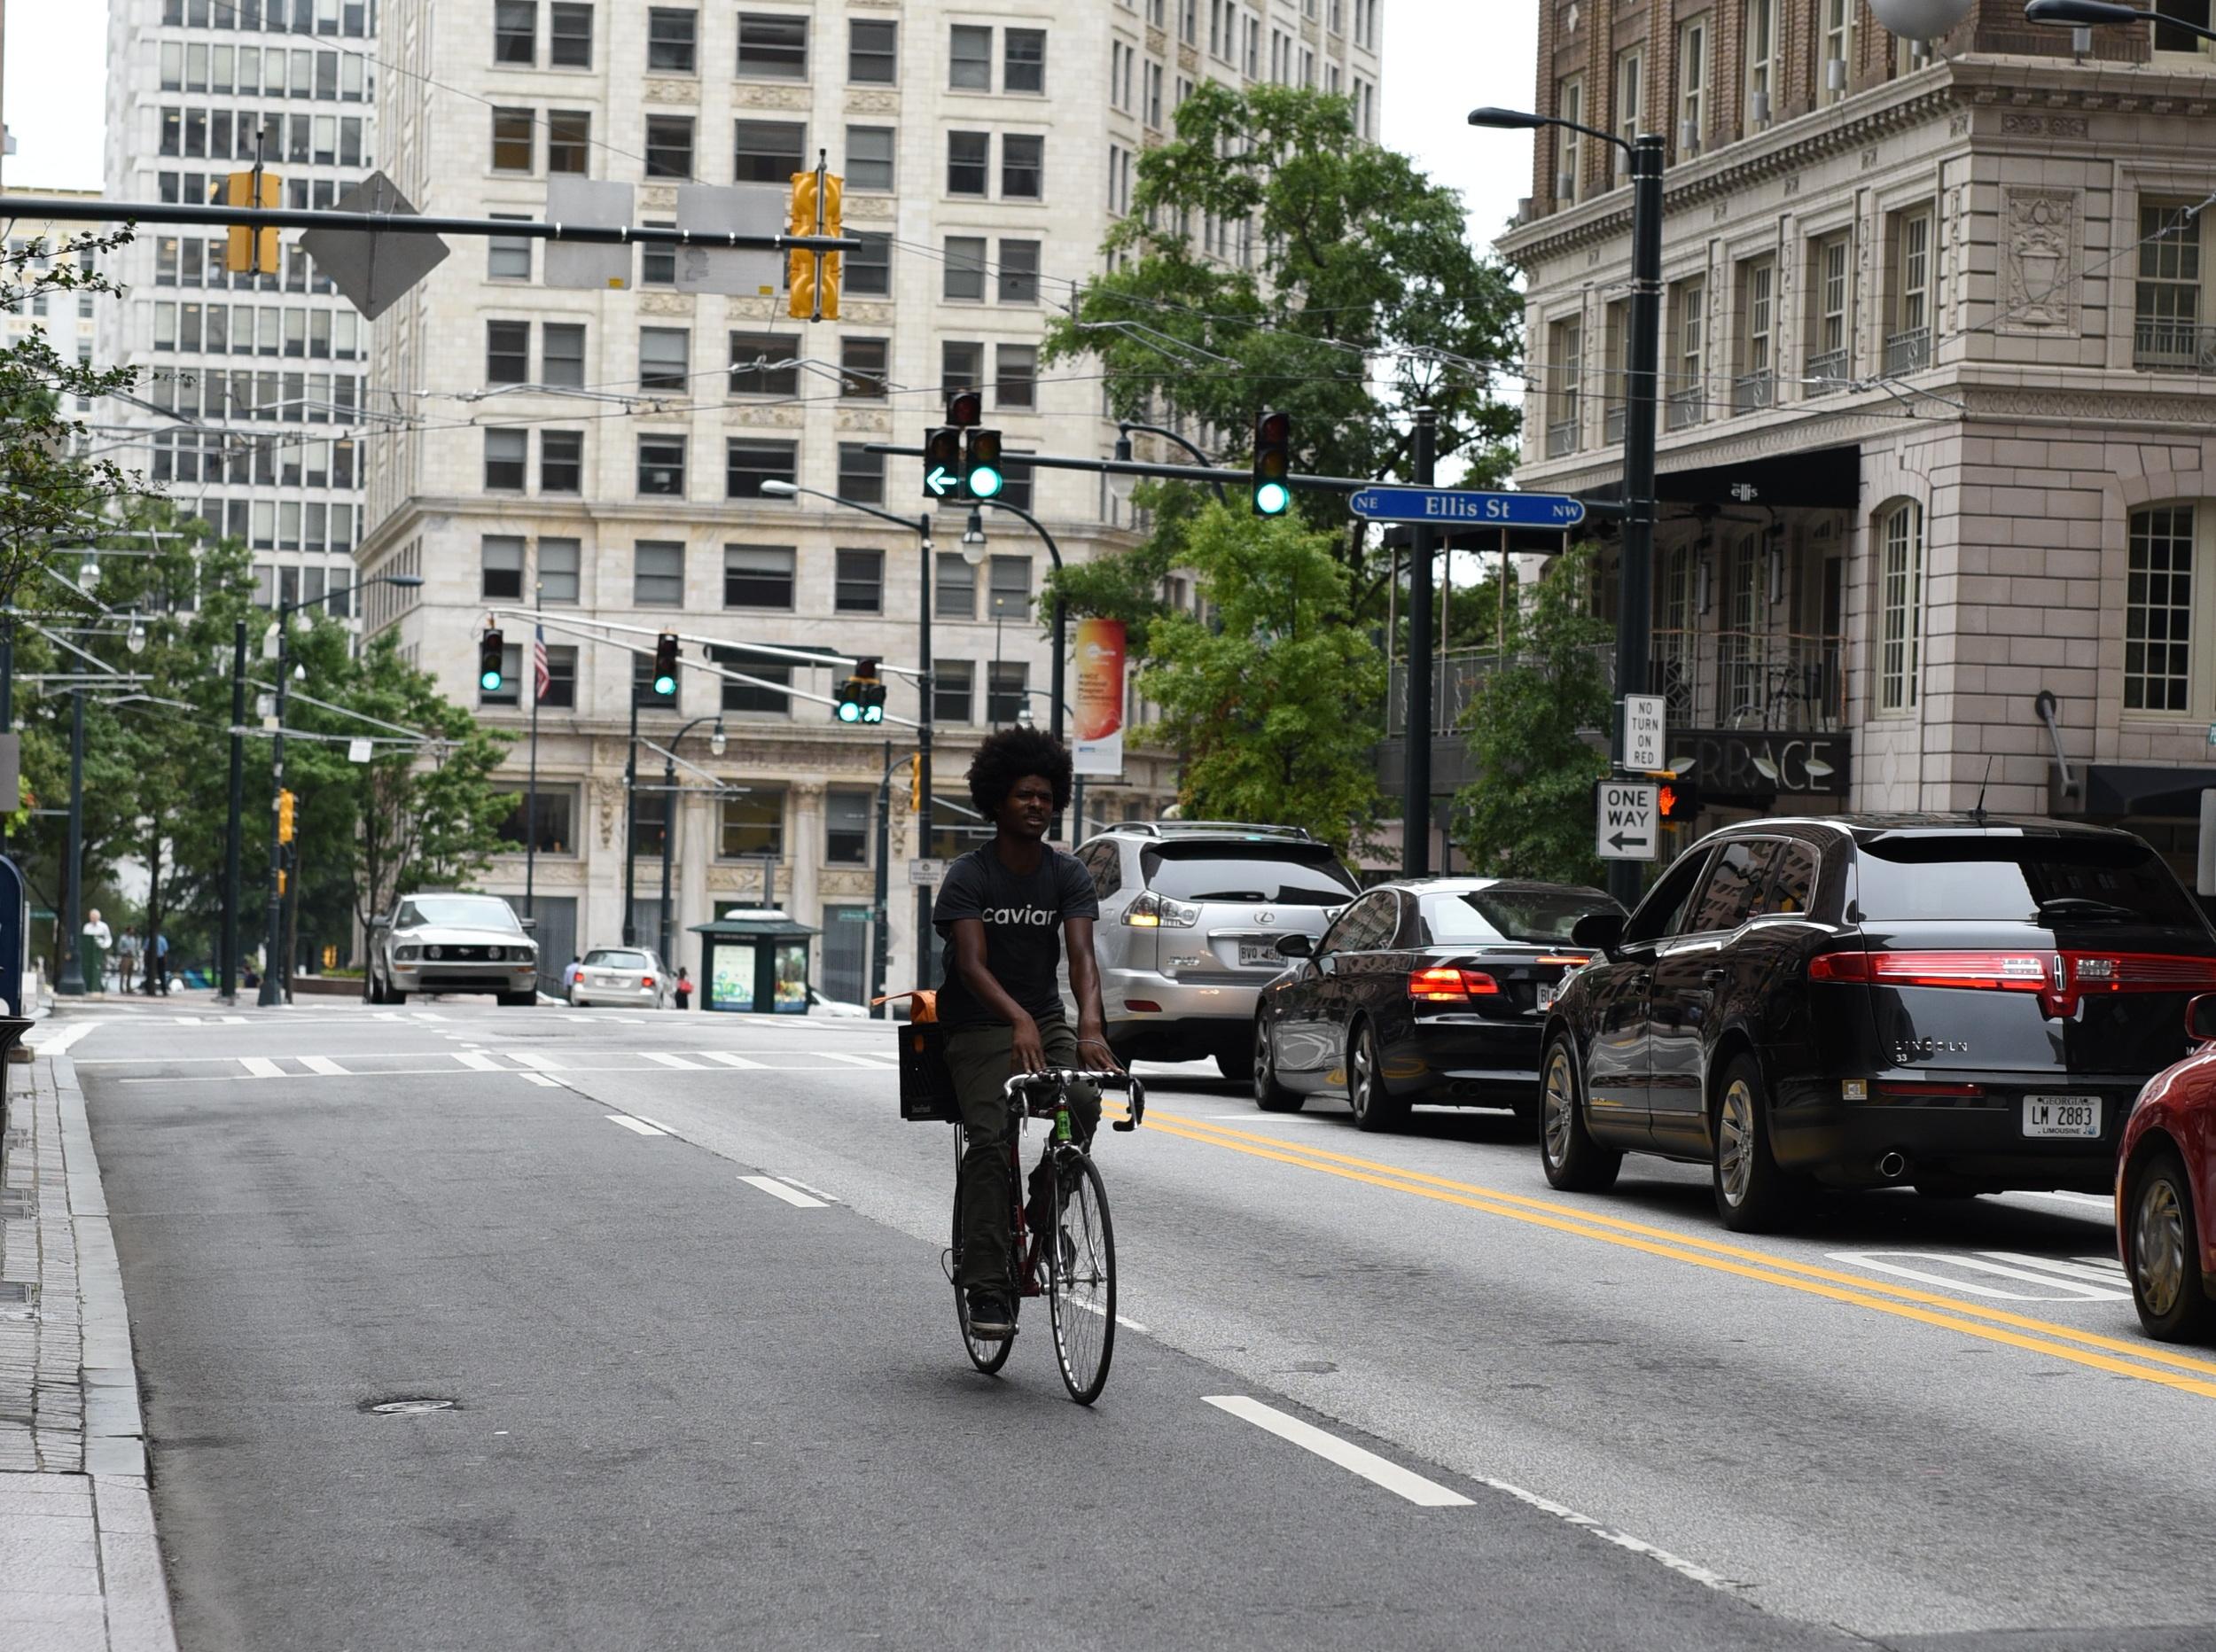 guy-on-bike.jpg